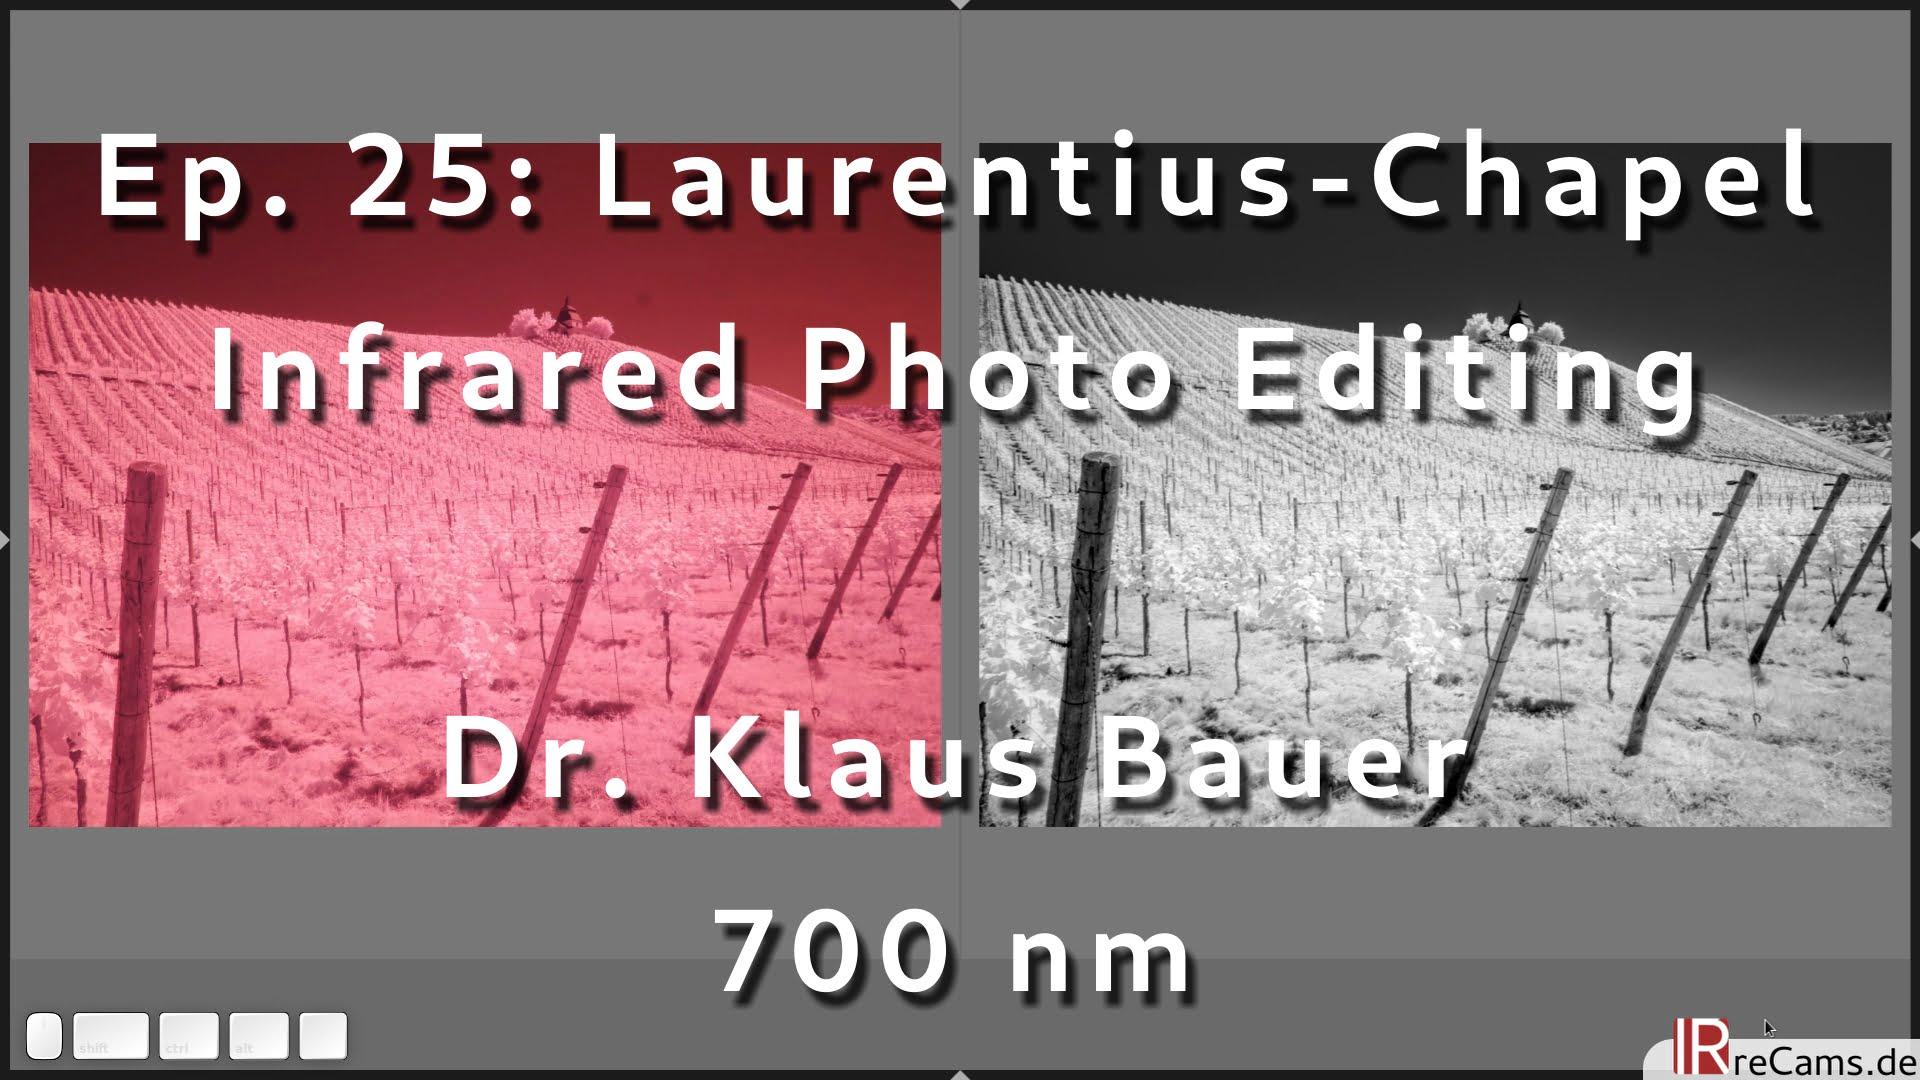 Ep. 25: Laurentius Chapel | Infrared Image Editing with darktable 3.4